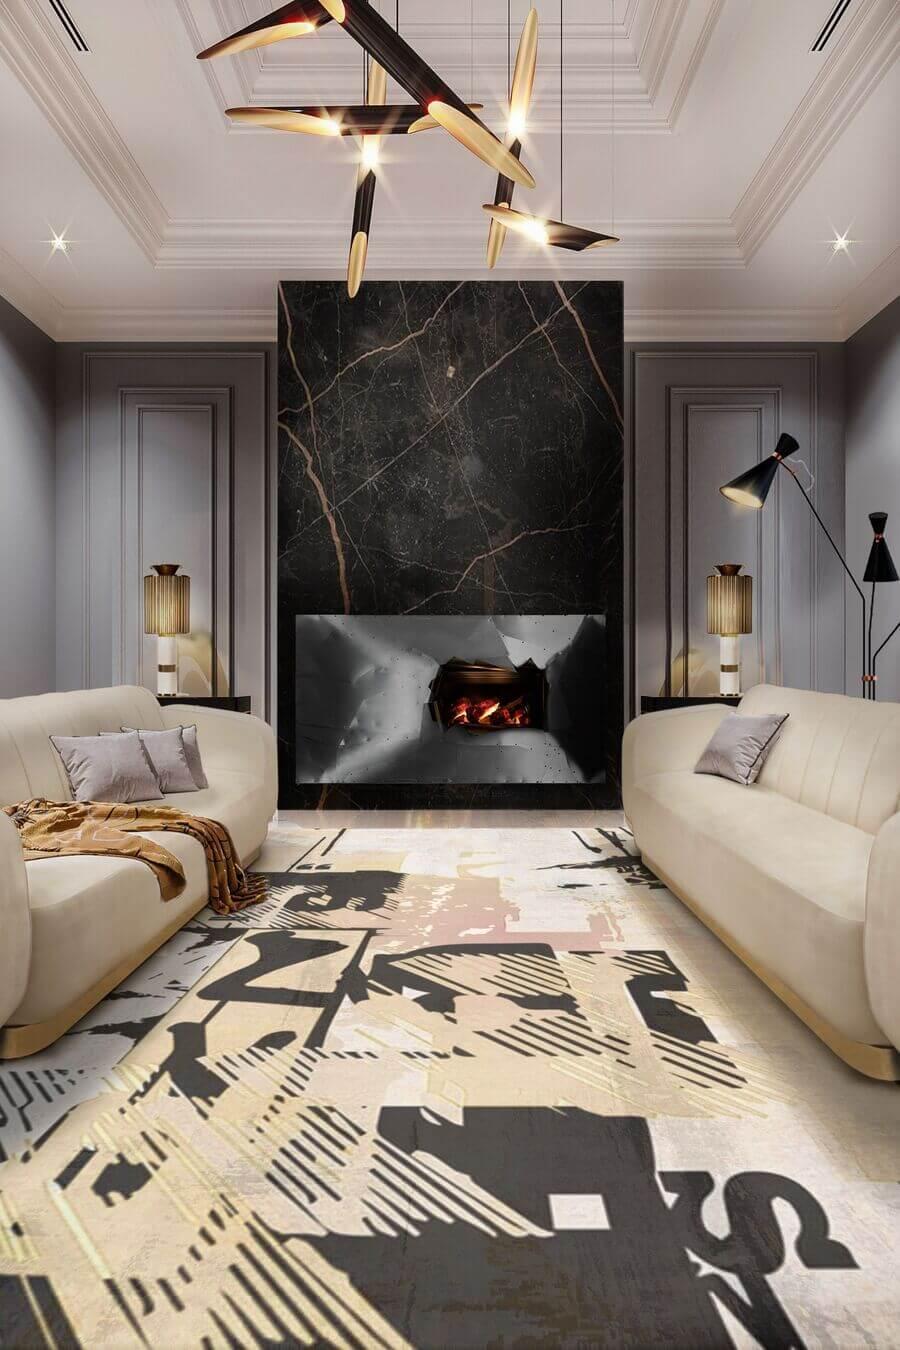 Trend Interior Design Ideas by Rug'Society